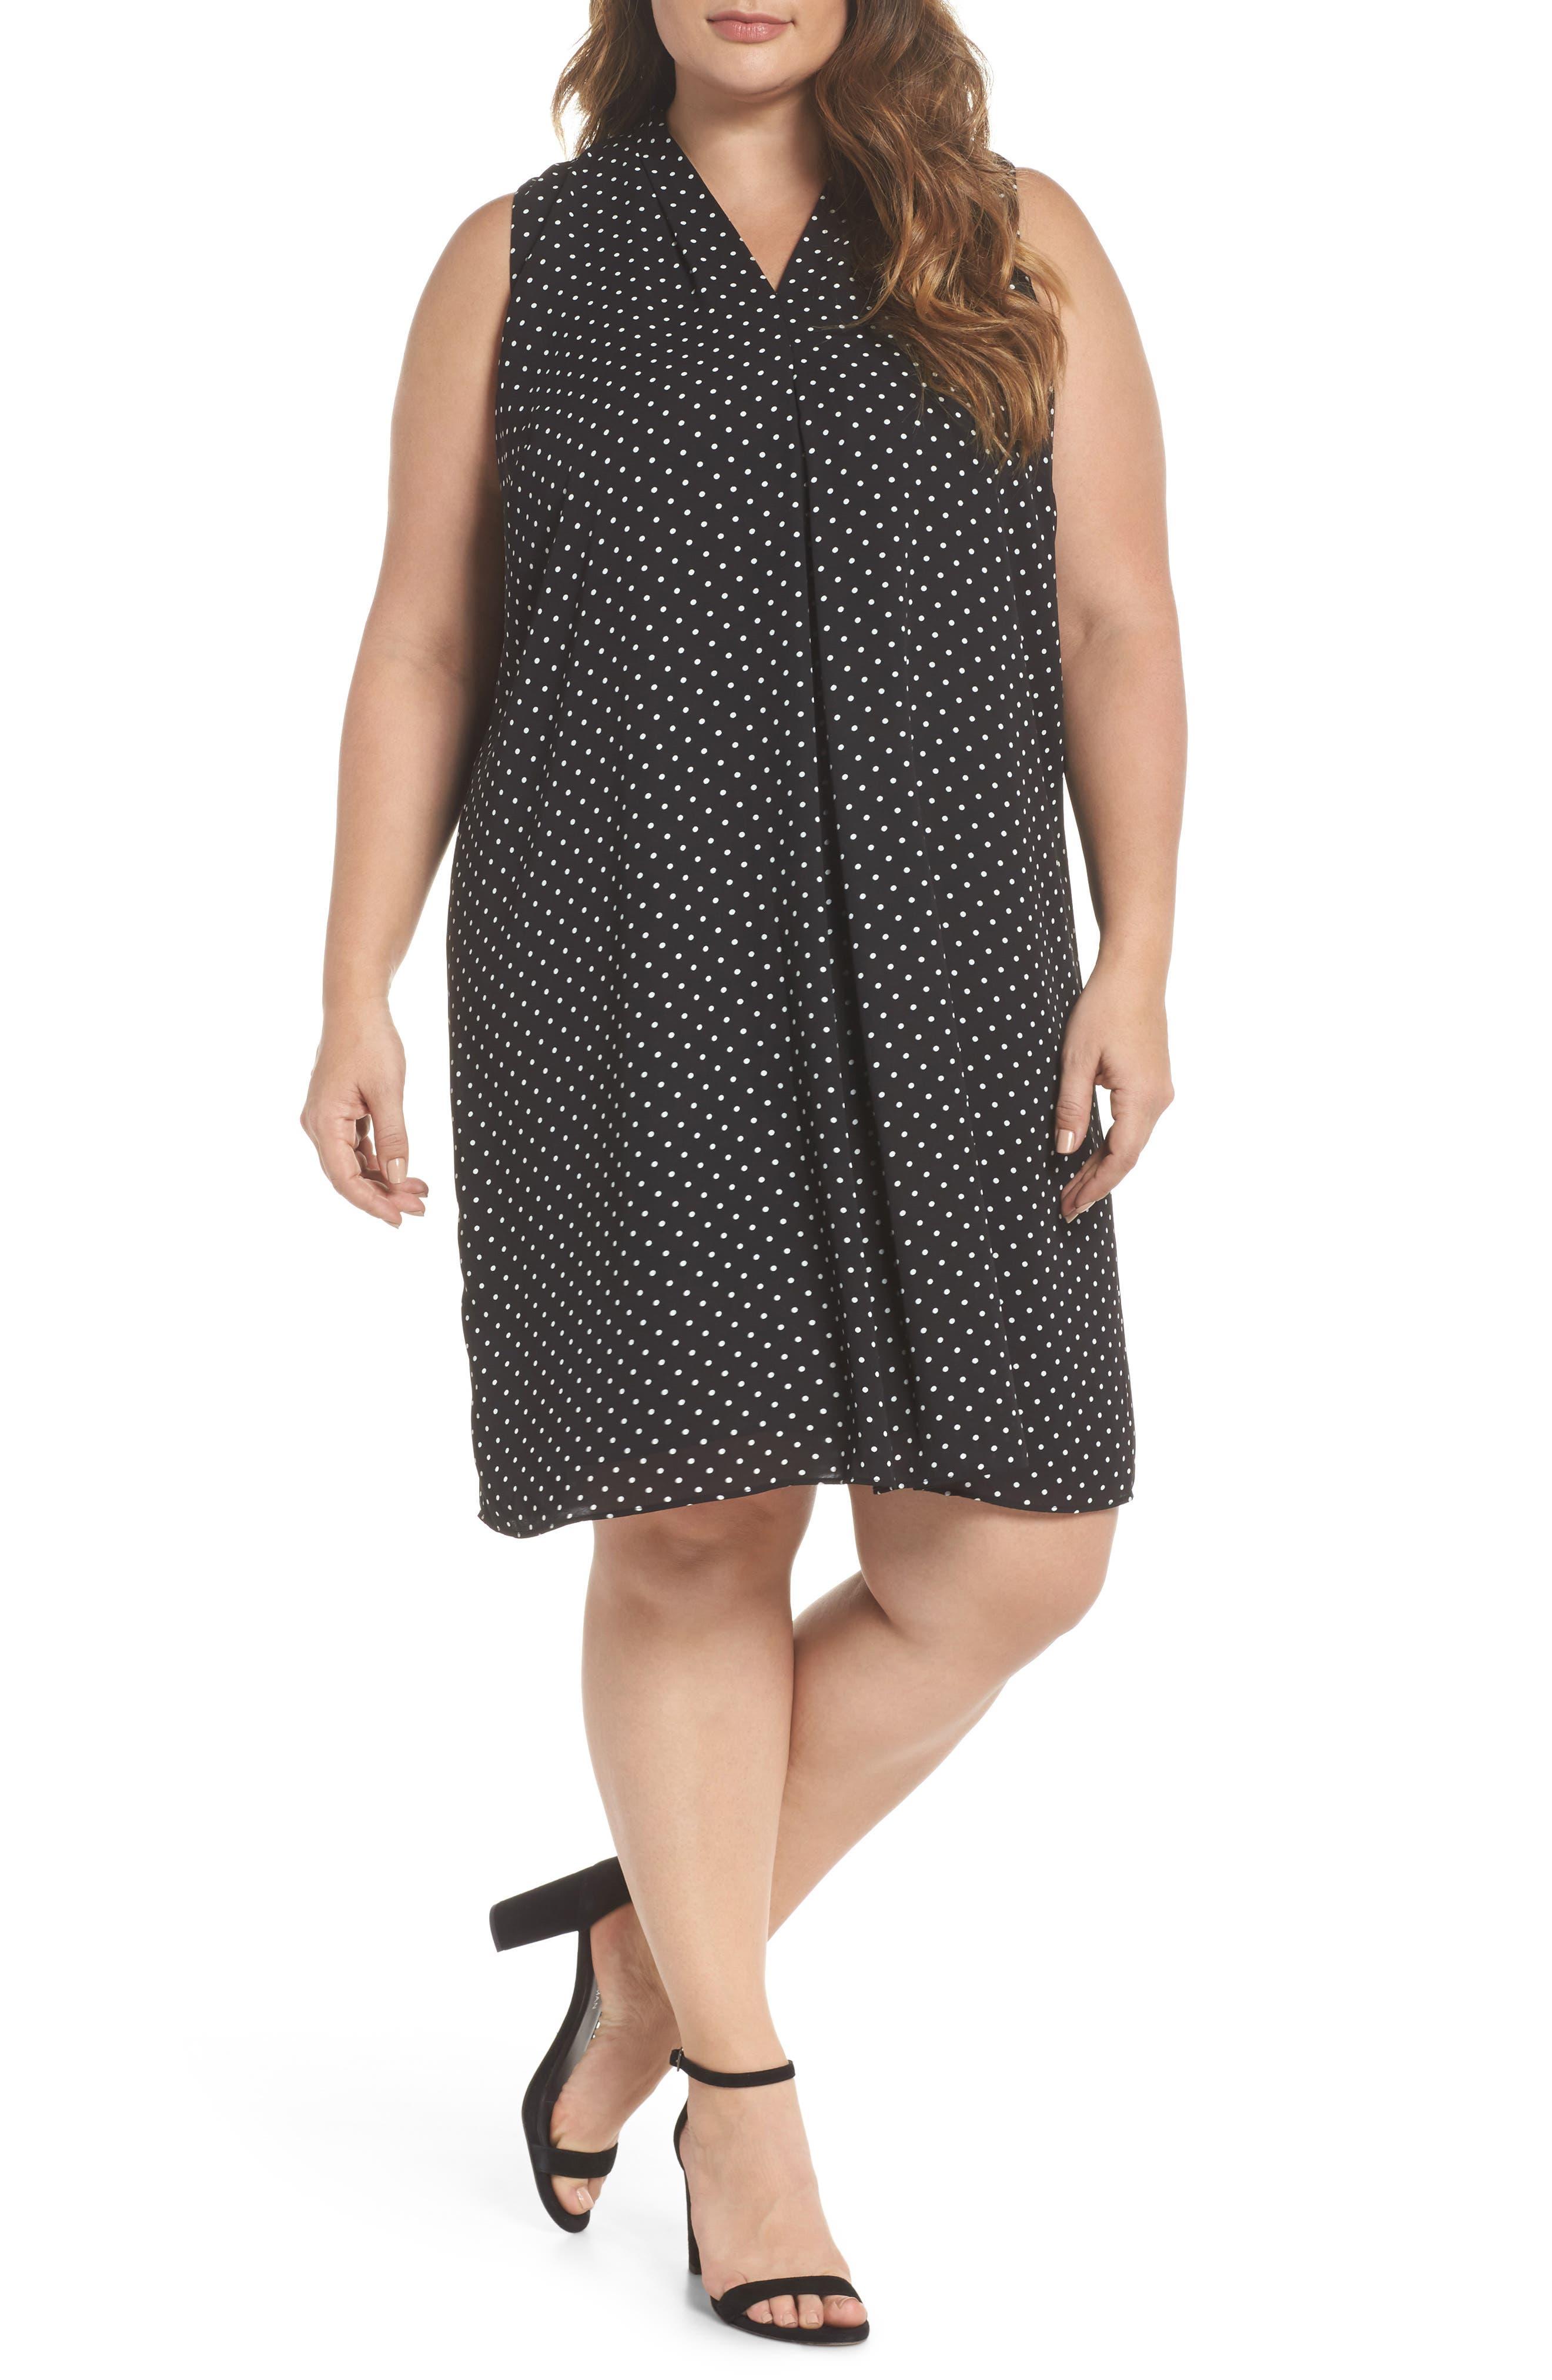 Poetic Dots Shift Dress,                         Main,                         color, 001